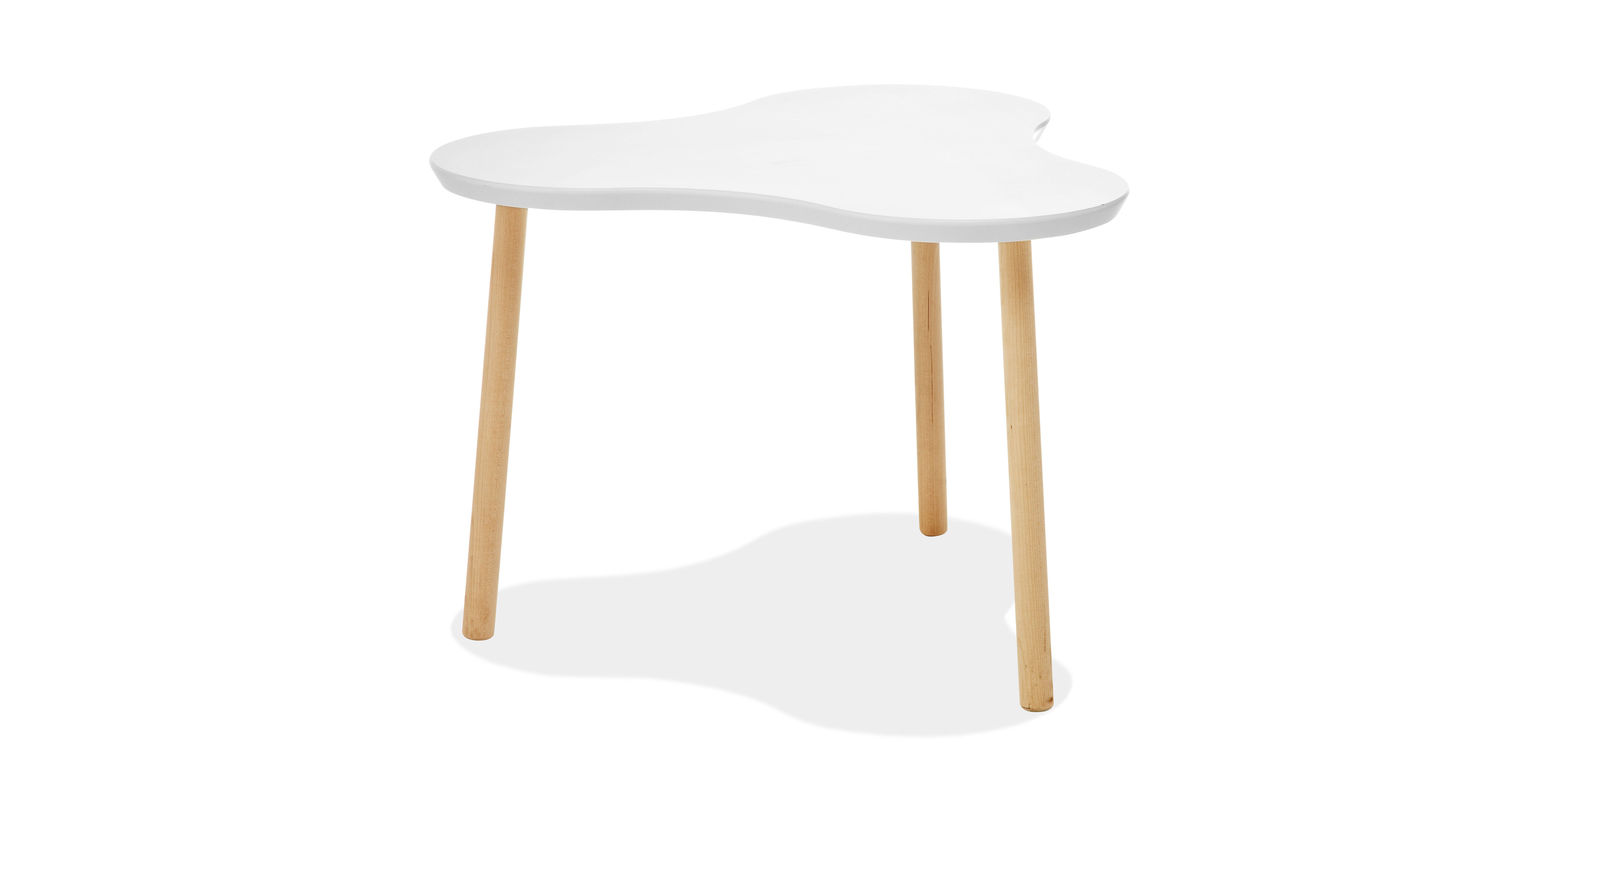 LIFETIME Kindersitzgruppe Monino mit Tisch in Kleeblattform